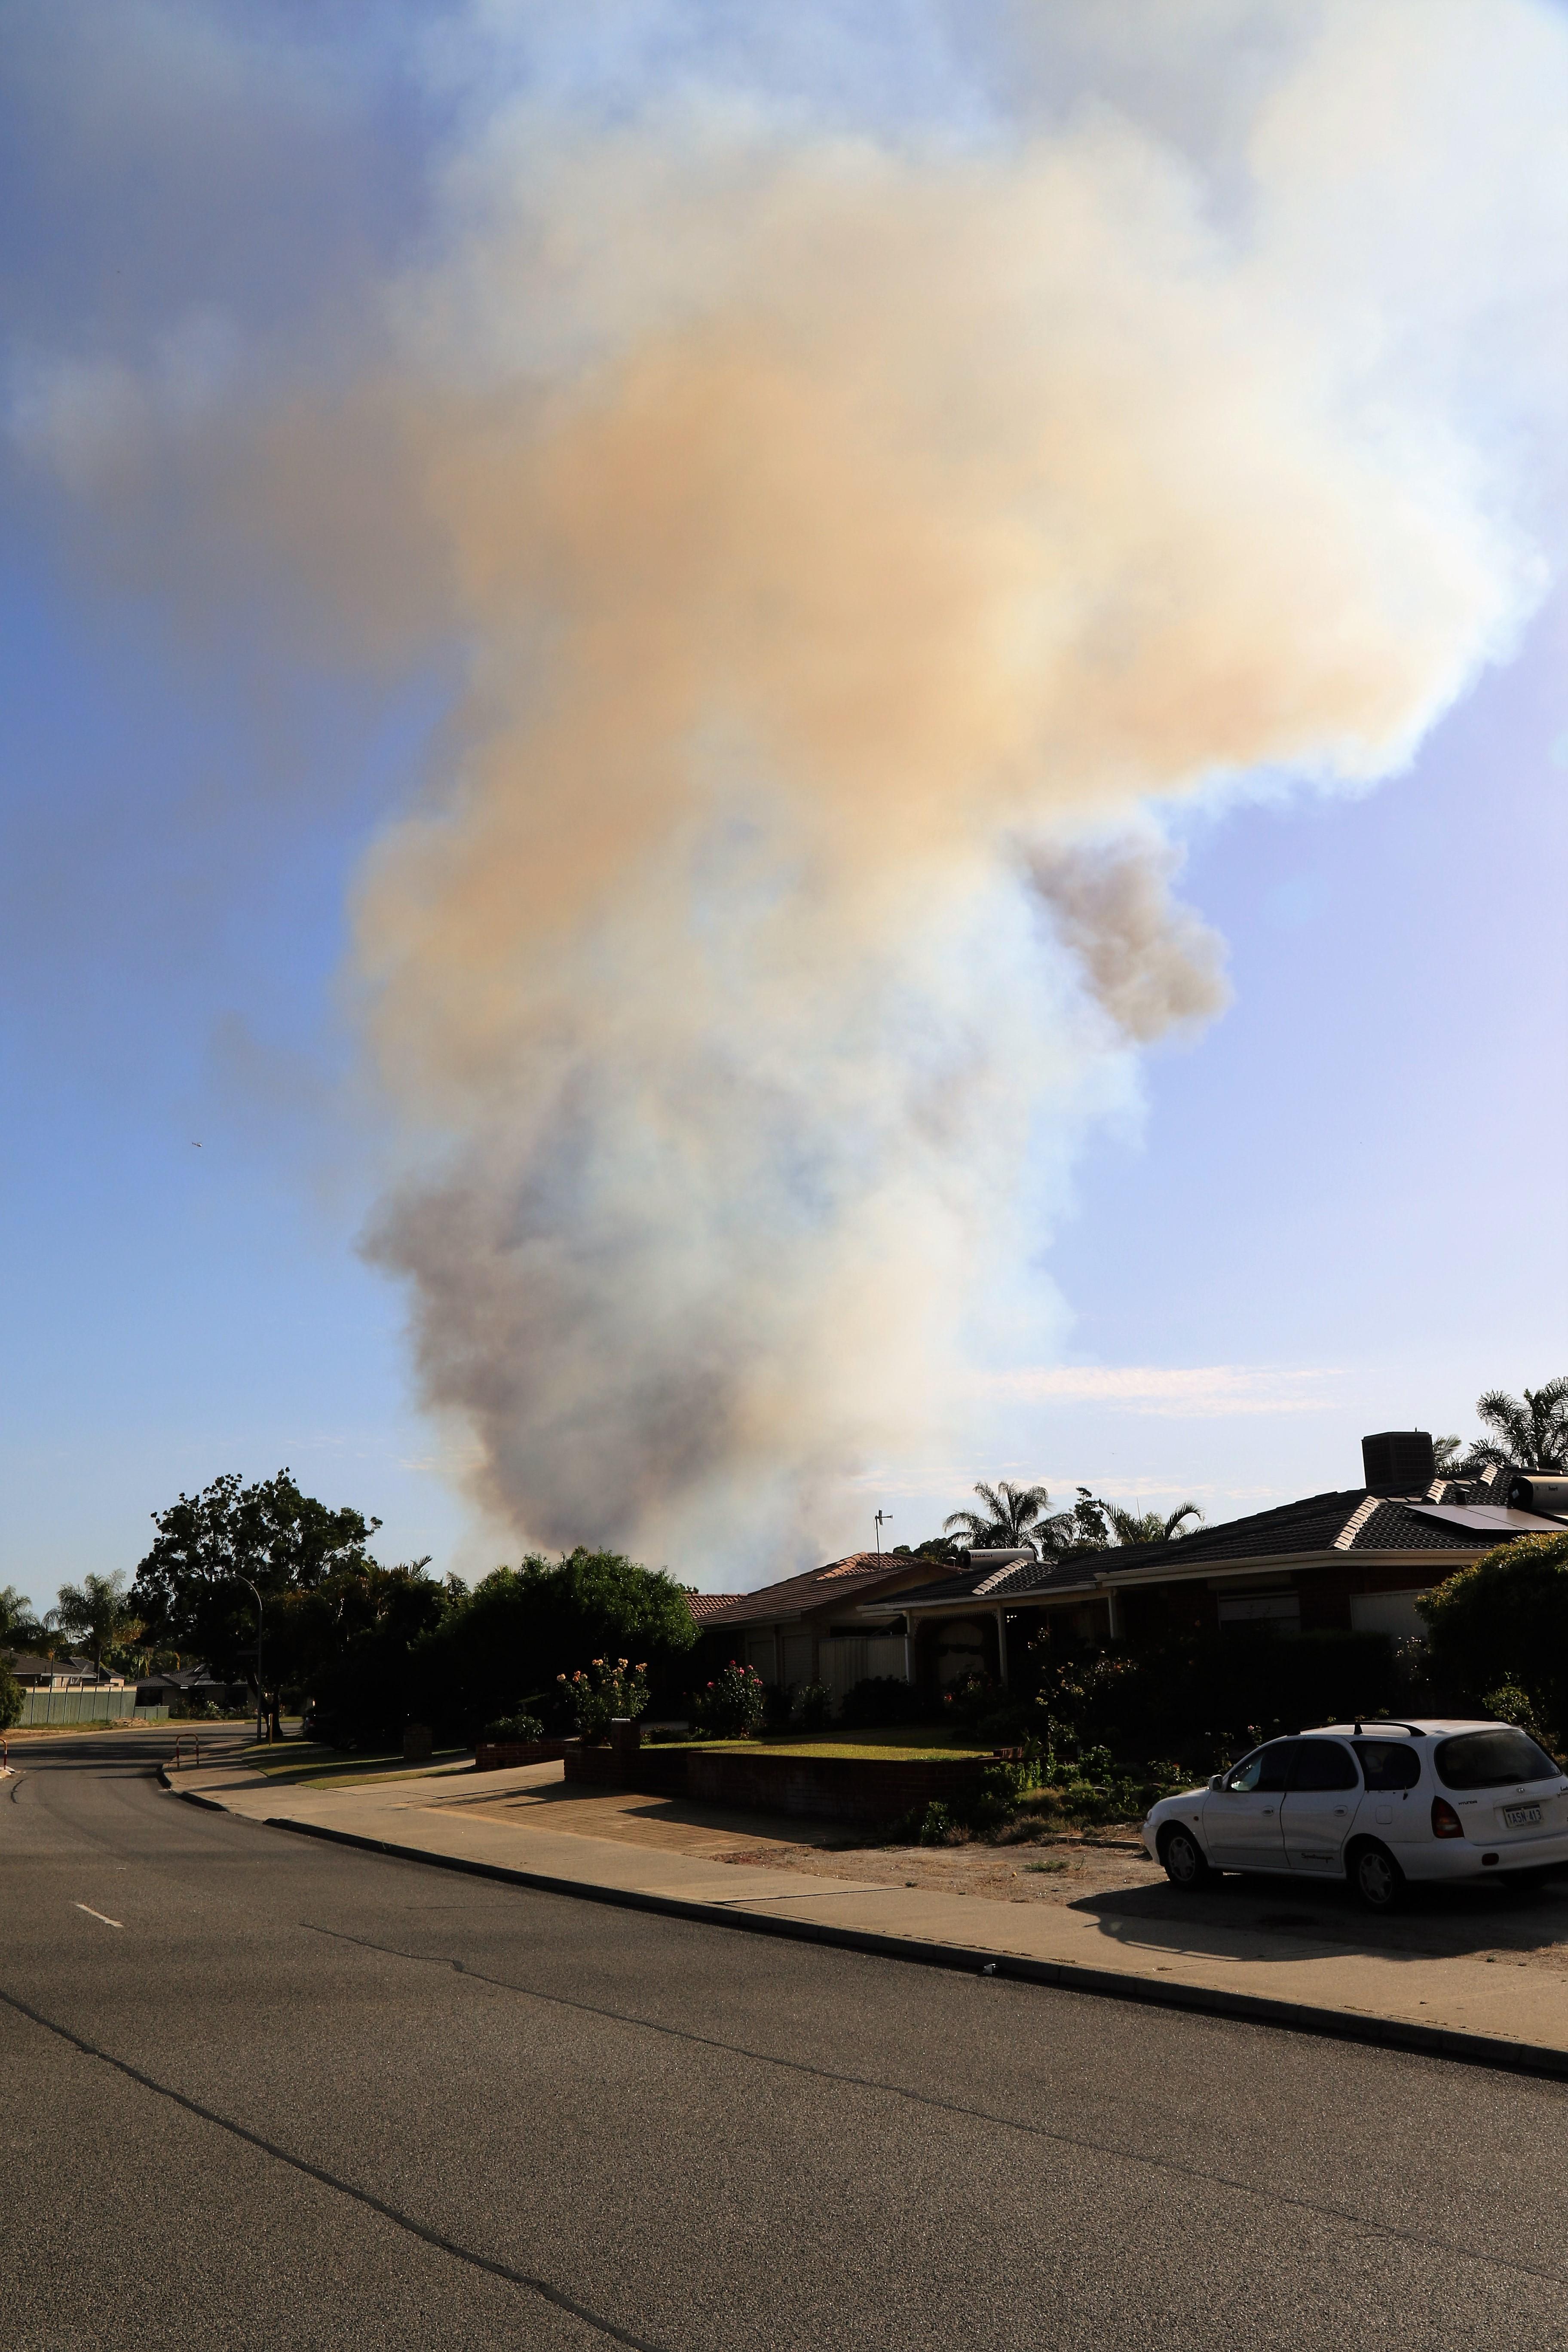 Smoke Plume - Bushfire - Near Waterperry Drive, Perth WA.